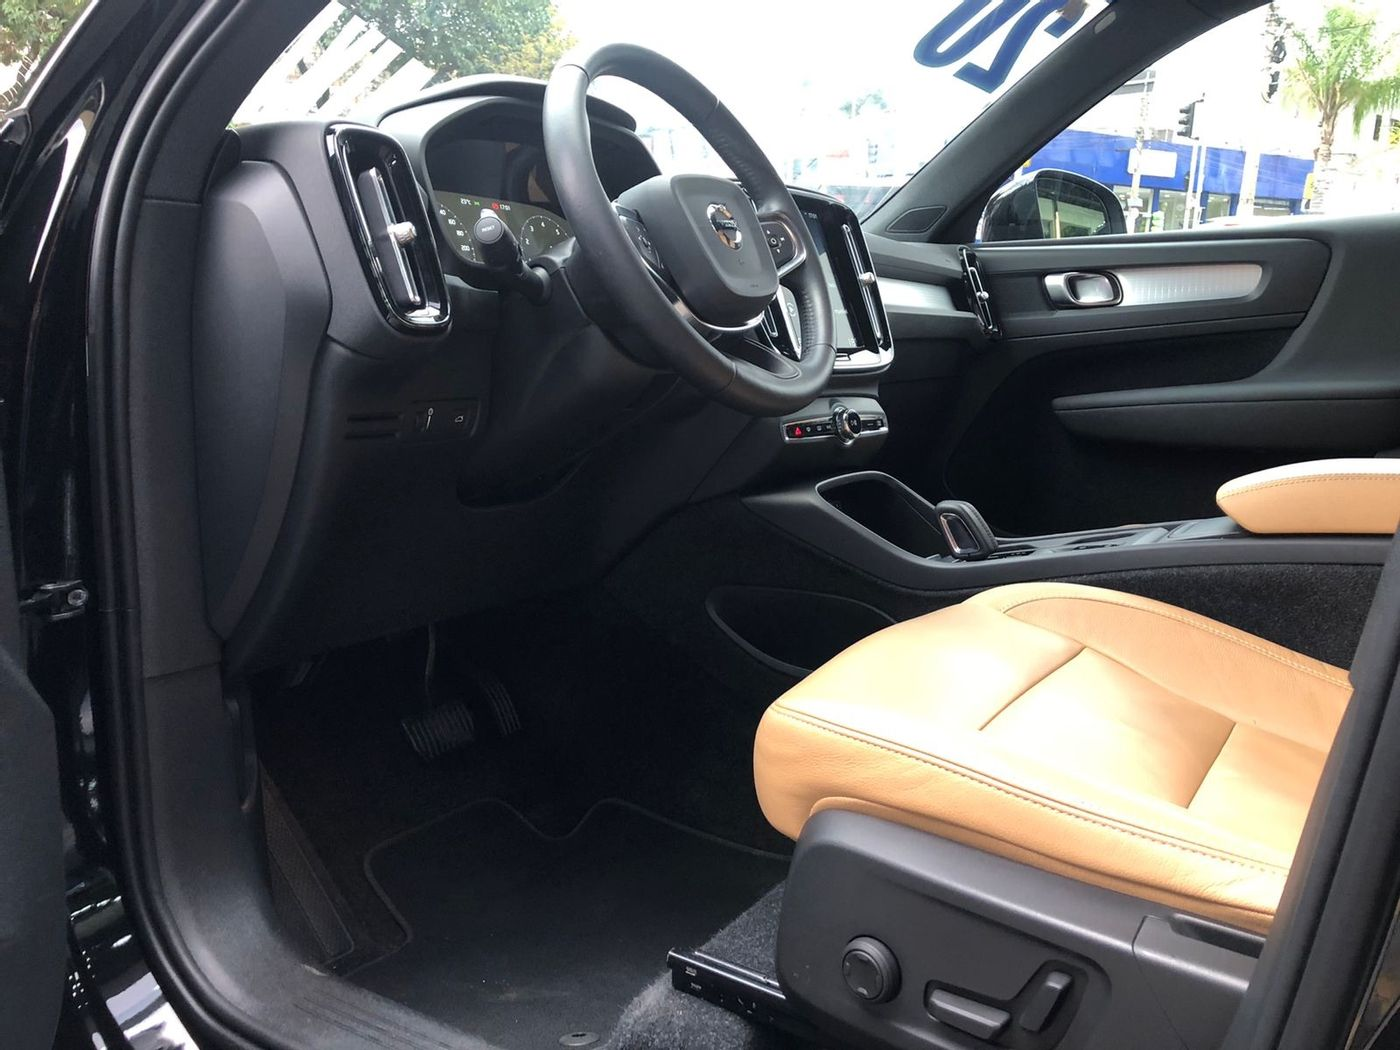 Volvo XC 40 T-4 MOMENTUM 2.0 190cv FWD